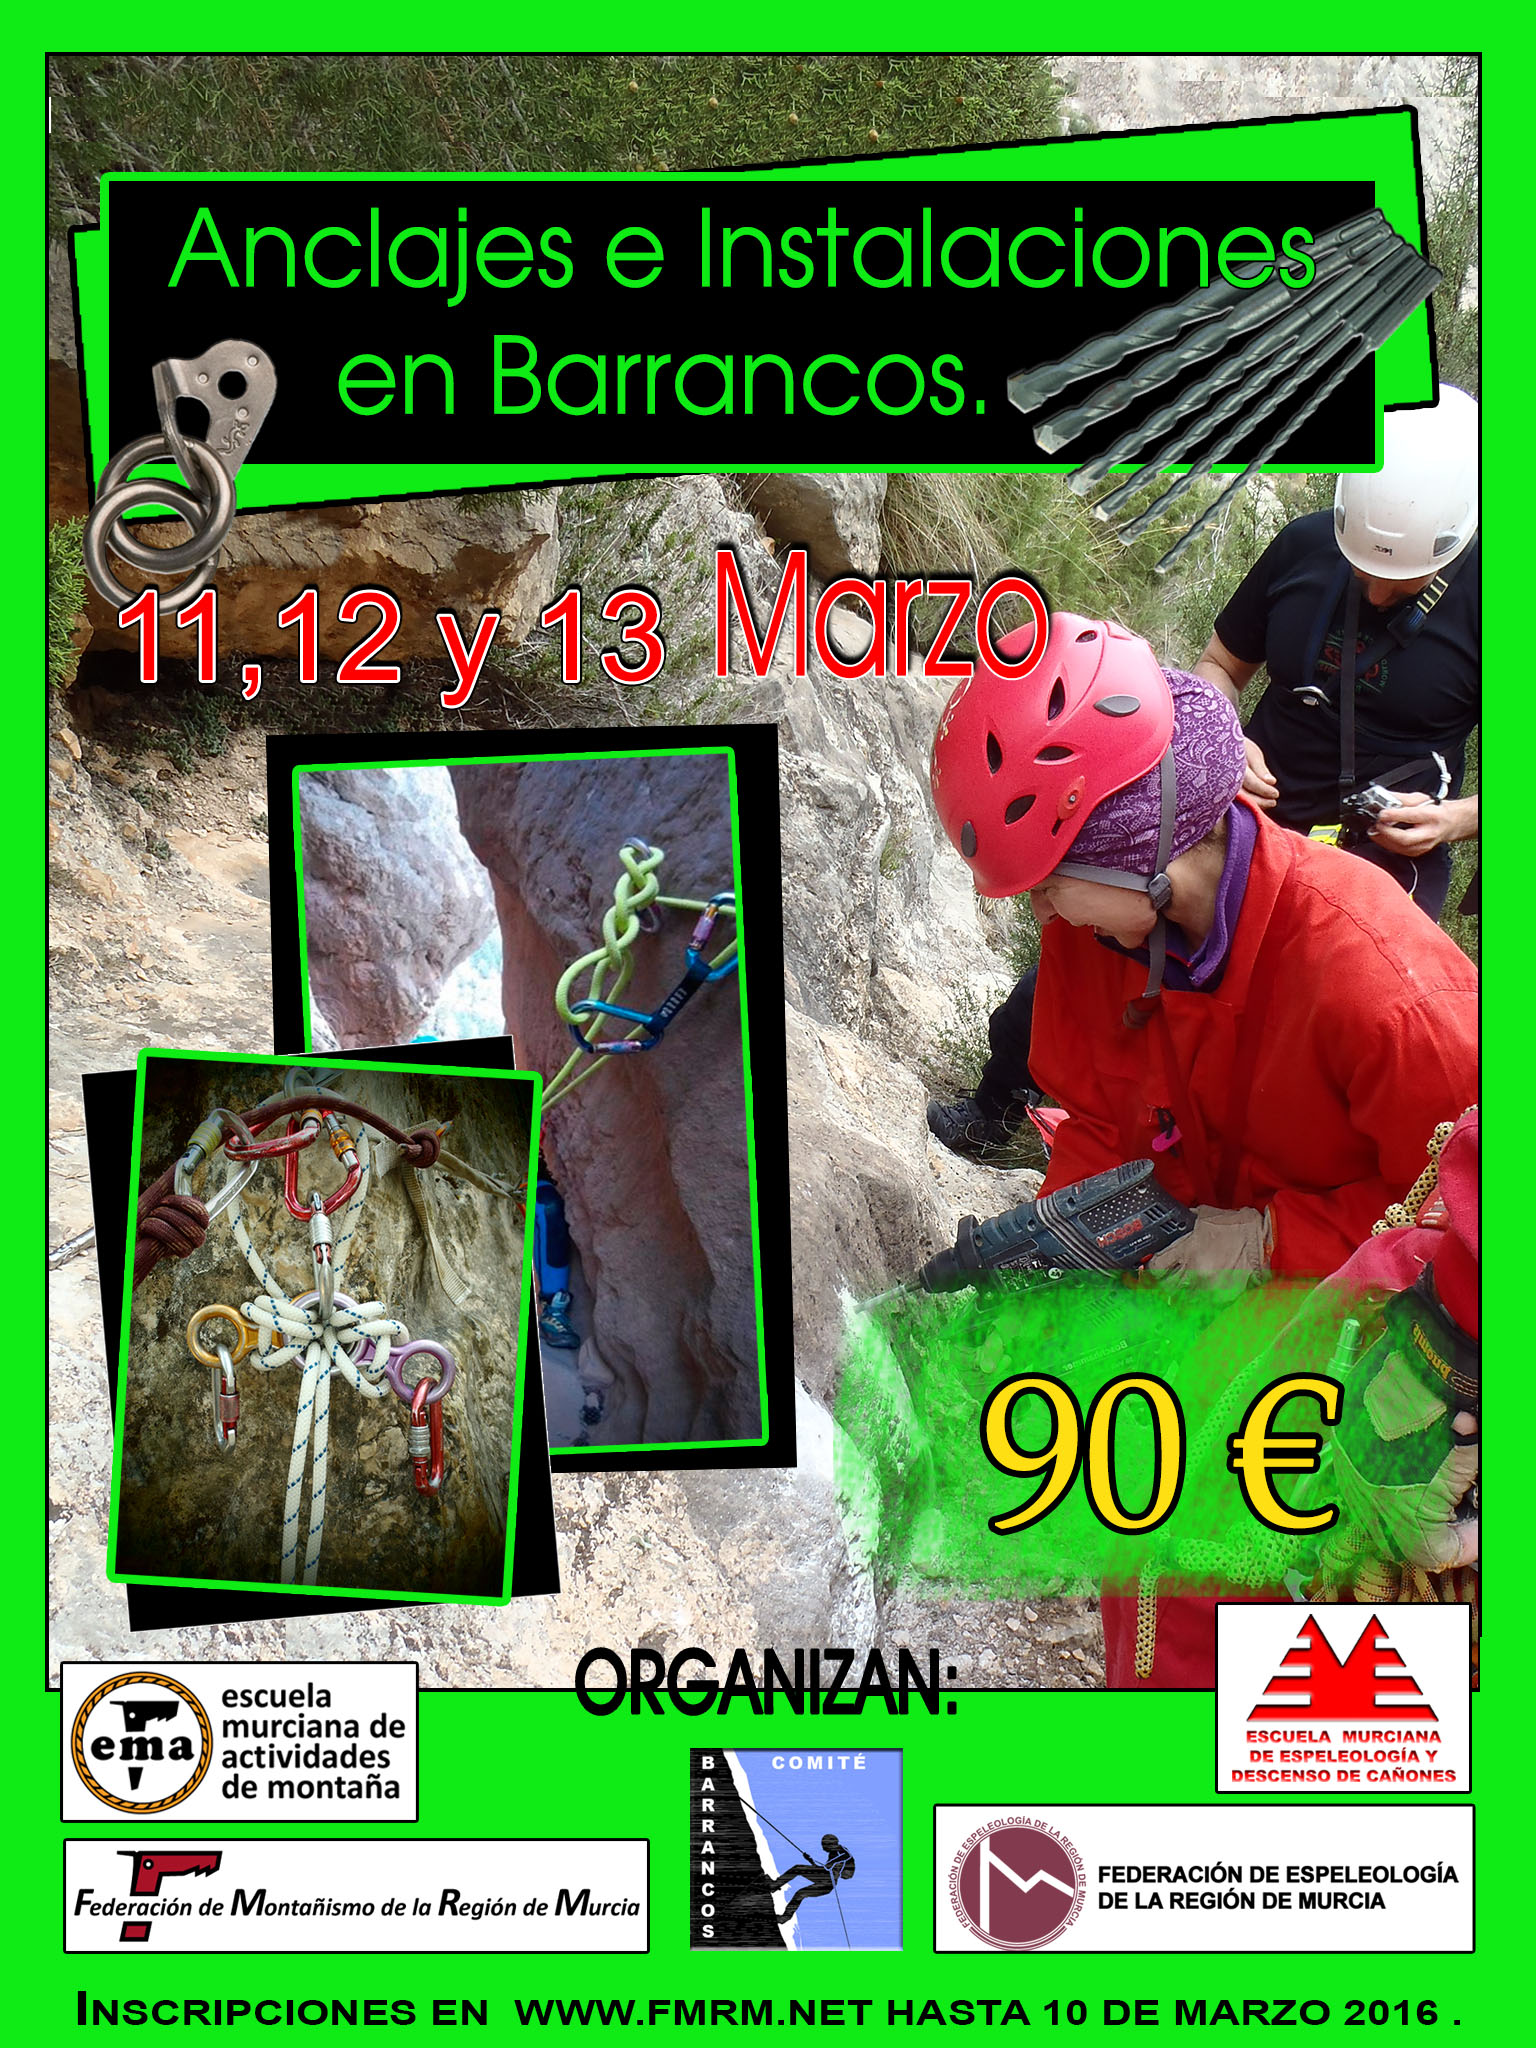 MB02-2016-01 Cartel Anclajes e Instalaciones en Barrancos